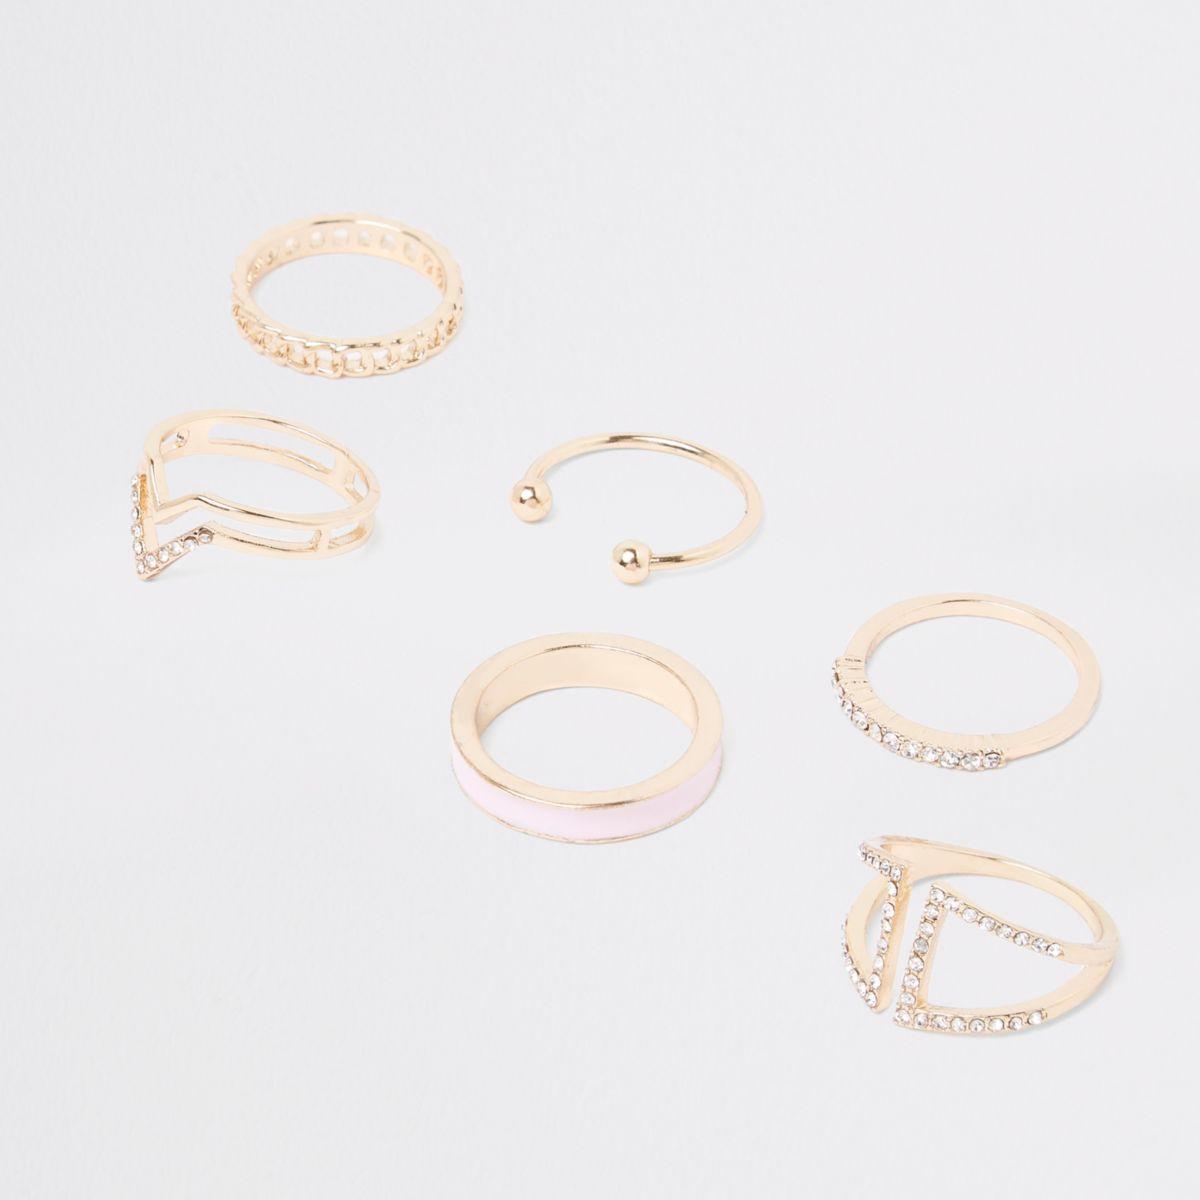 Gold tone rhinestone paved ring pack